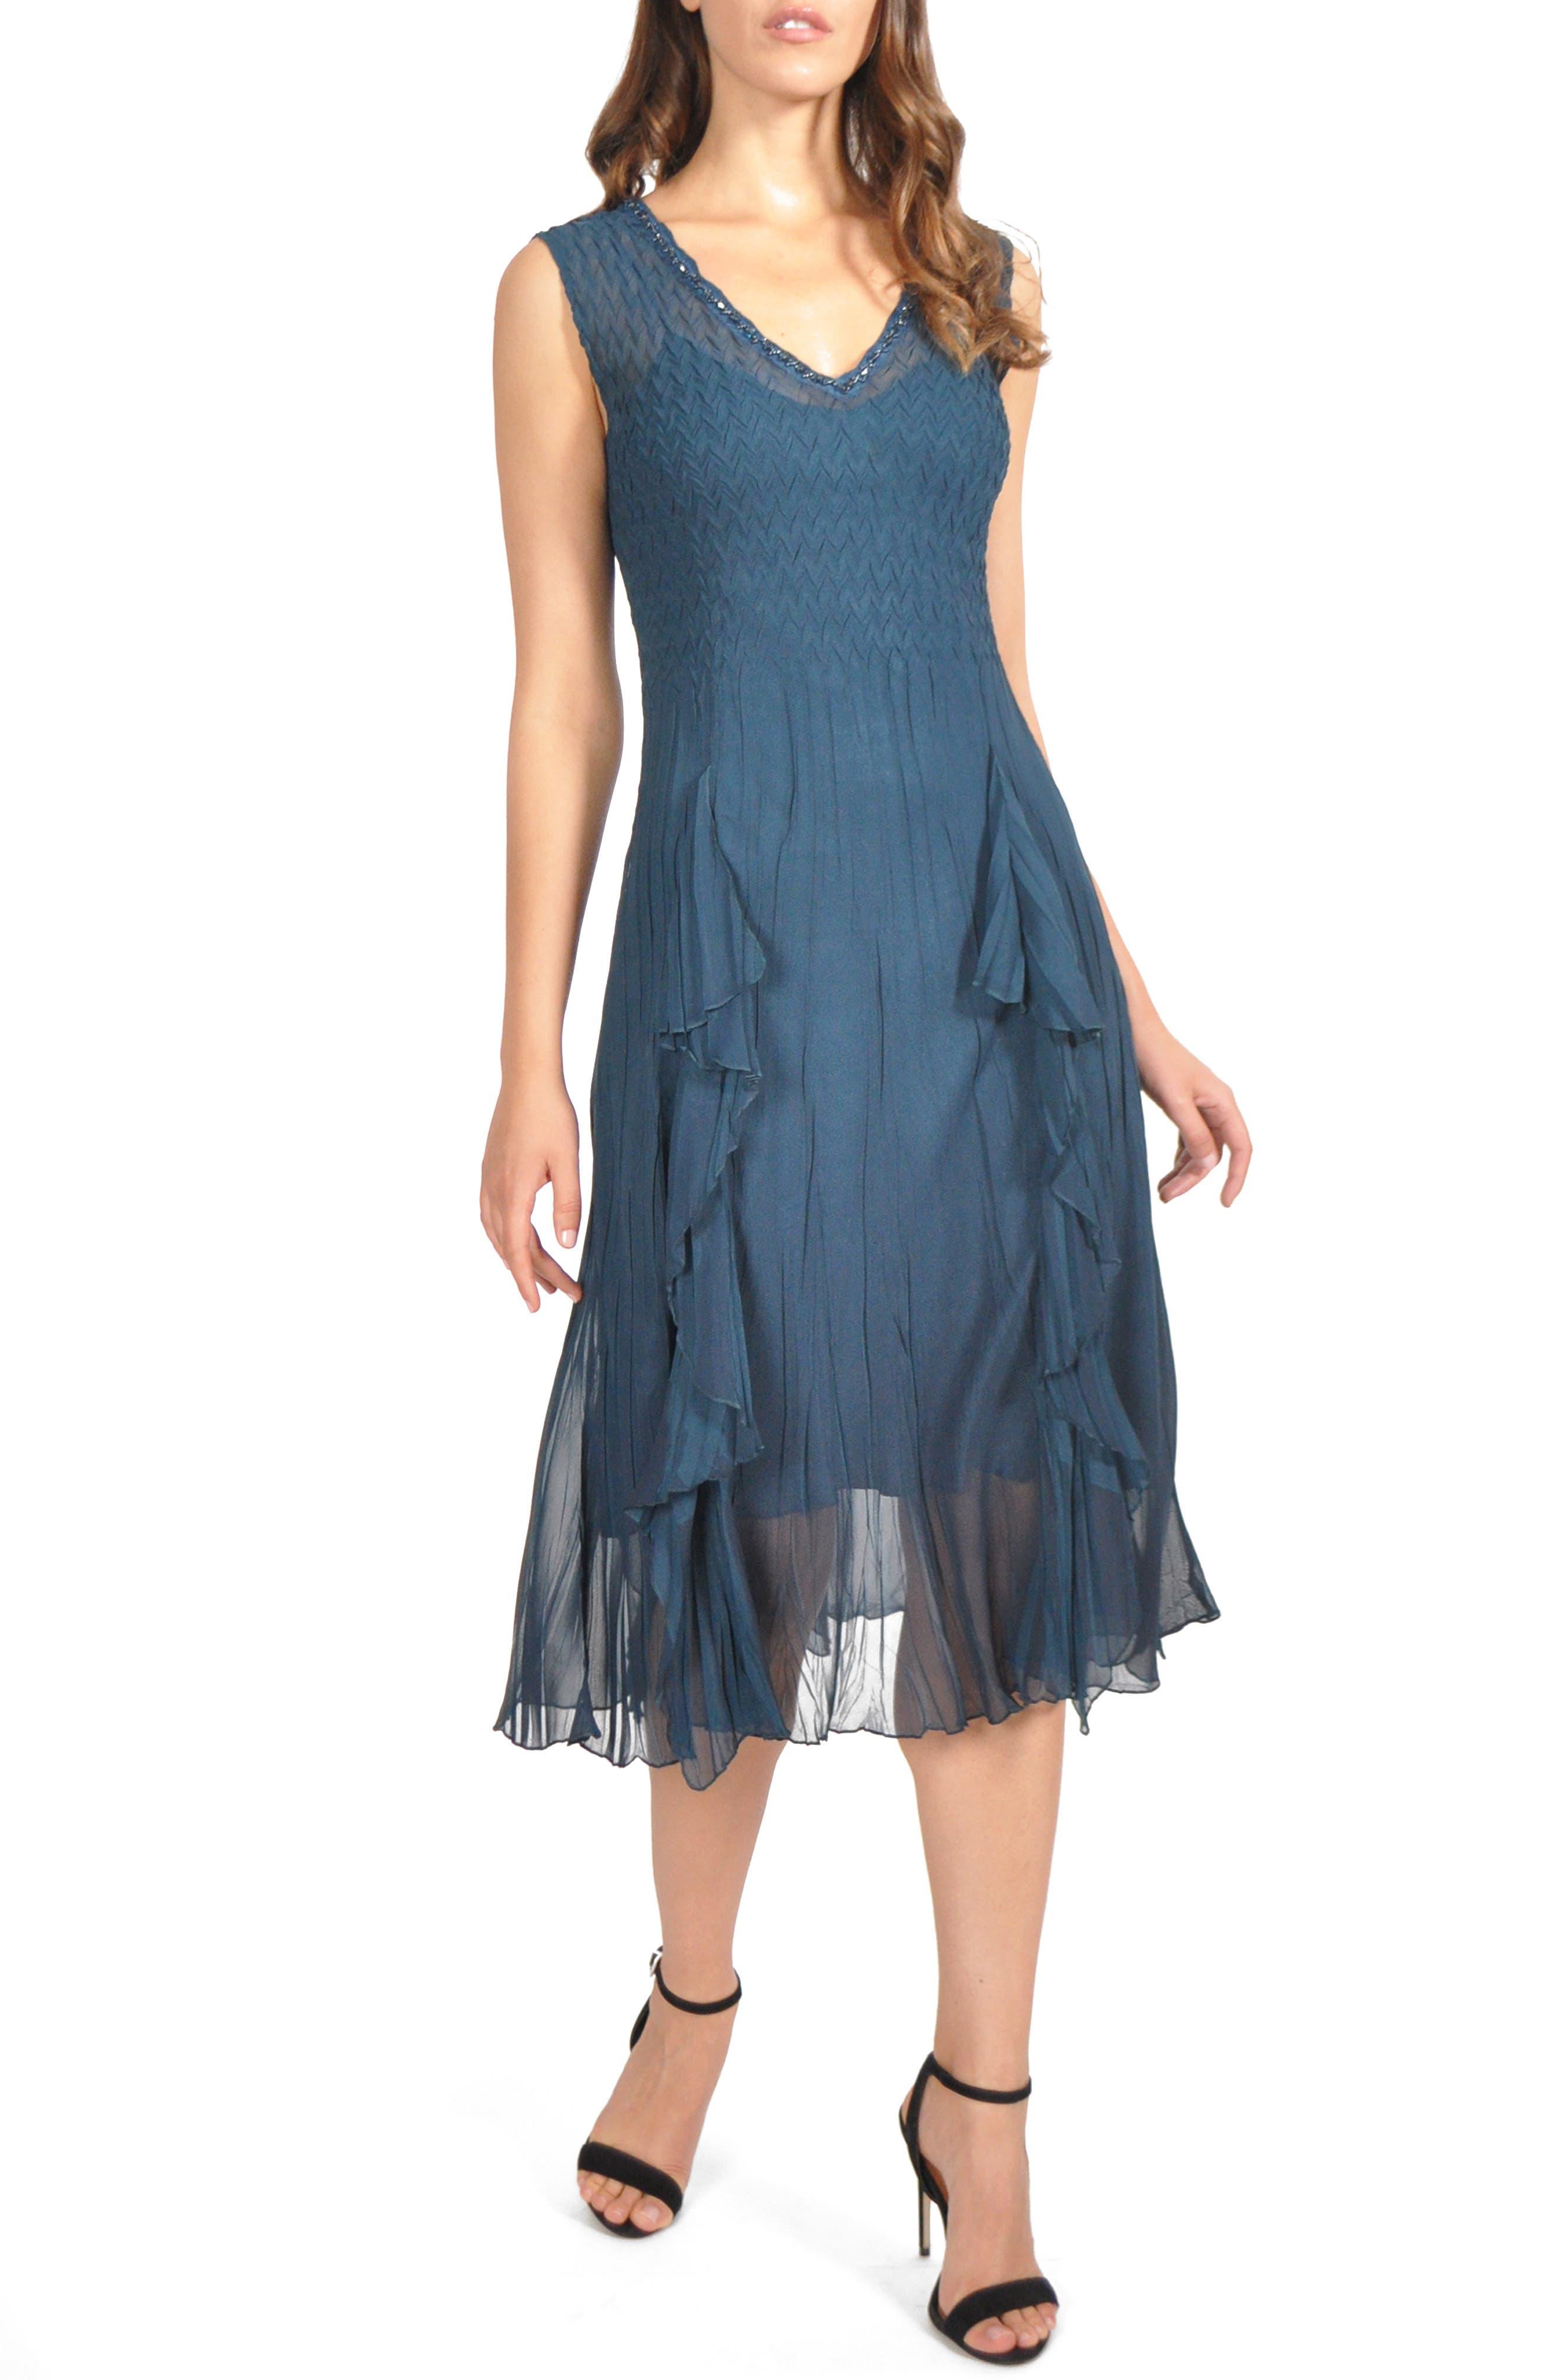 KOMAROV Ruffle Midi Dress, Main, color, 420